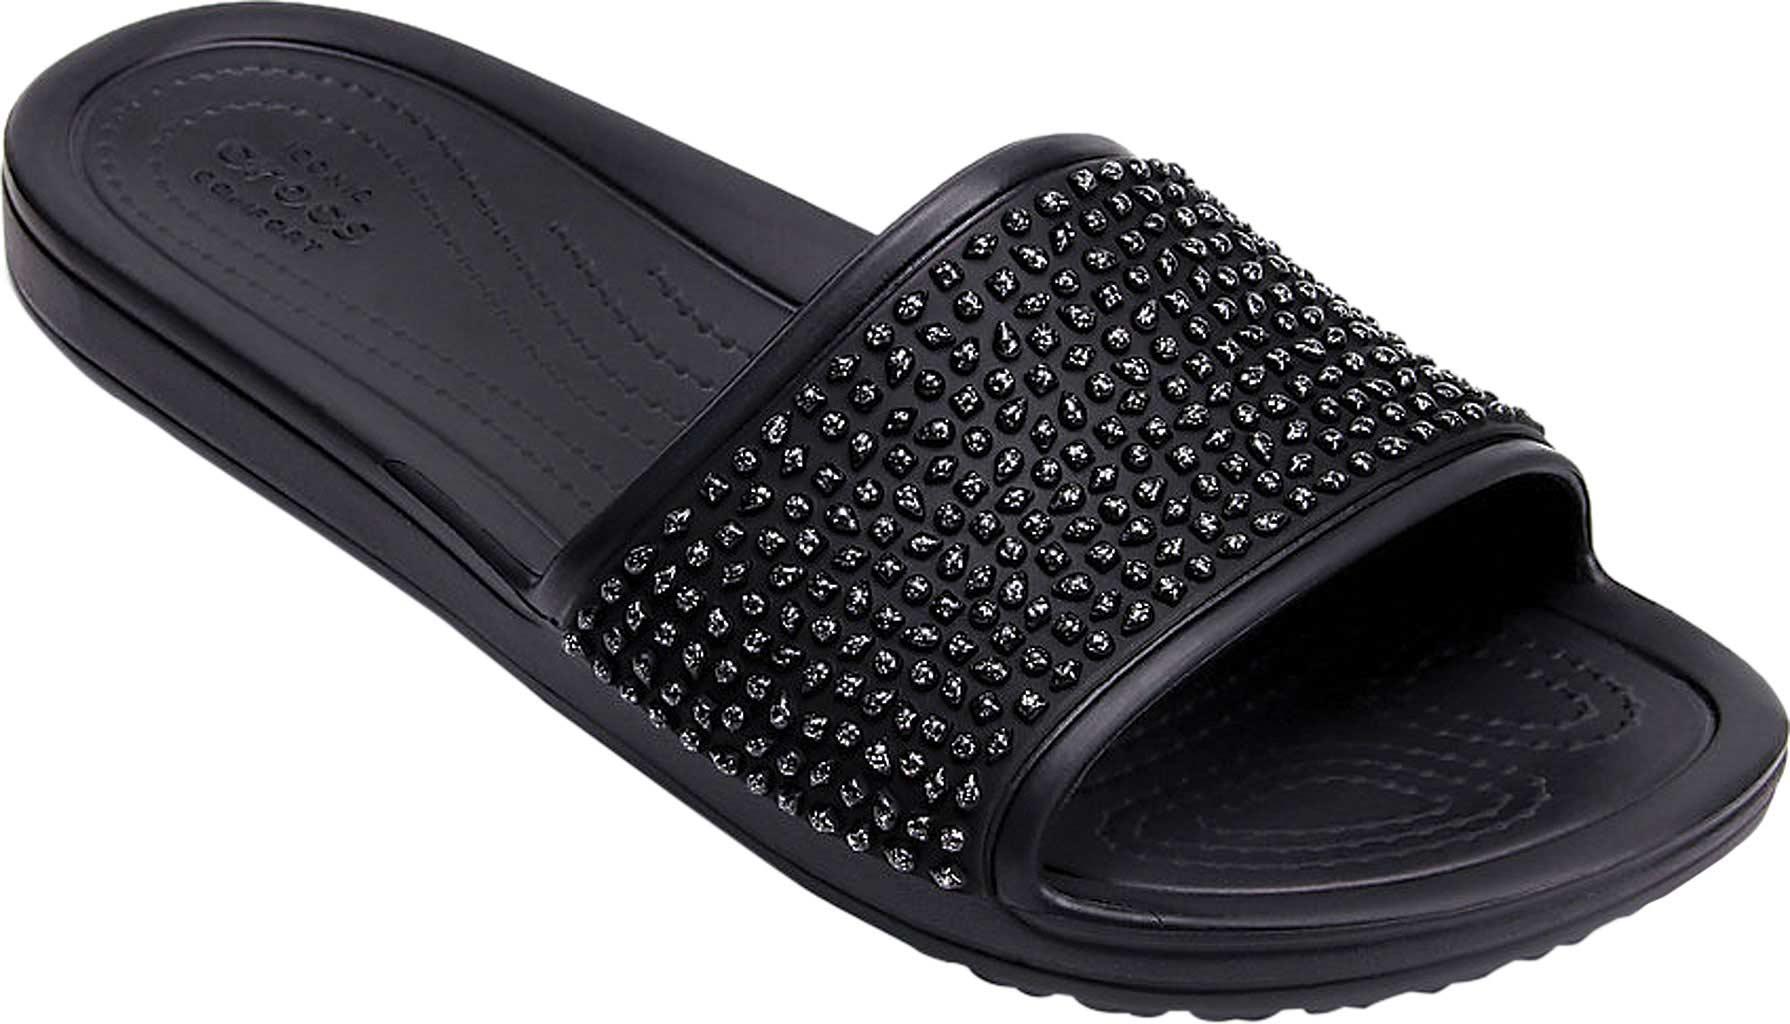 76acae49a07a Lyst - Crocs™ Sloane Embellished Slide in Black - Save 24%